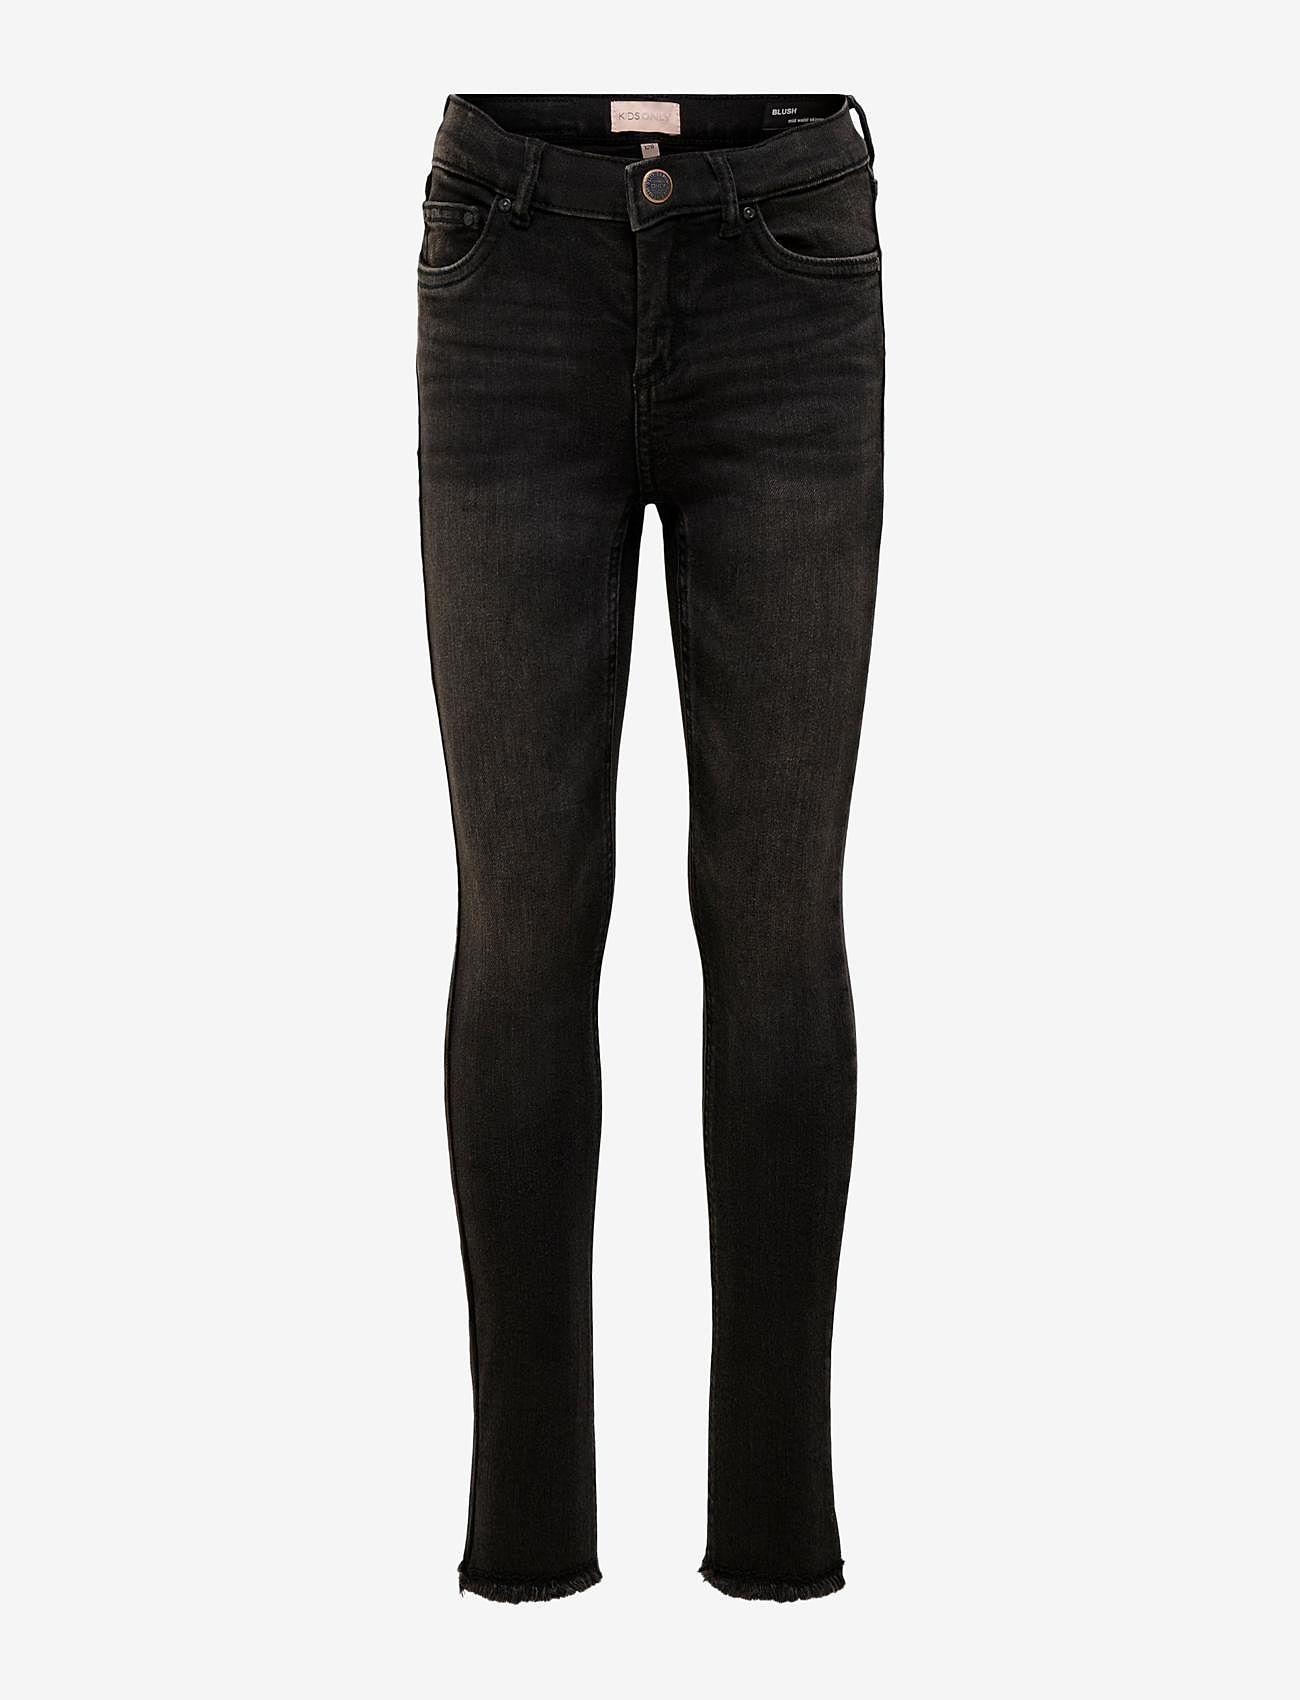 Kids Only - KONBLUSH SKINNY RAW JEANS 1099 NOOS - jeans - black denim - 0